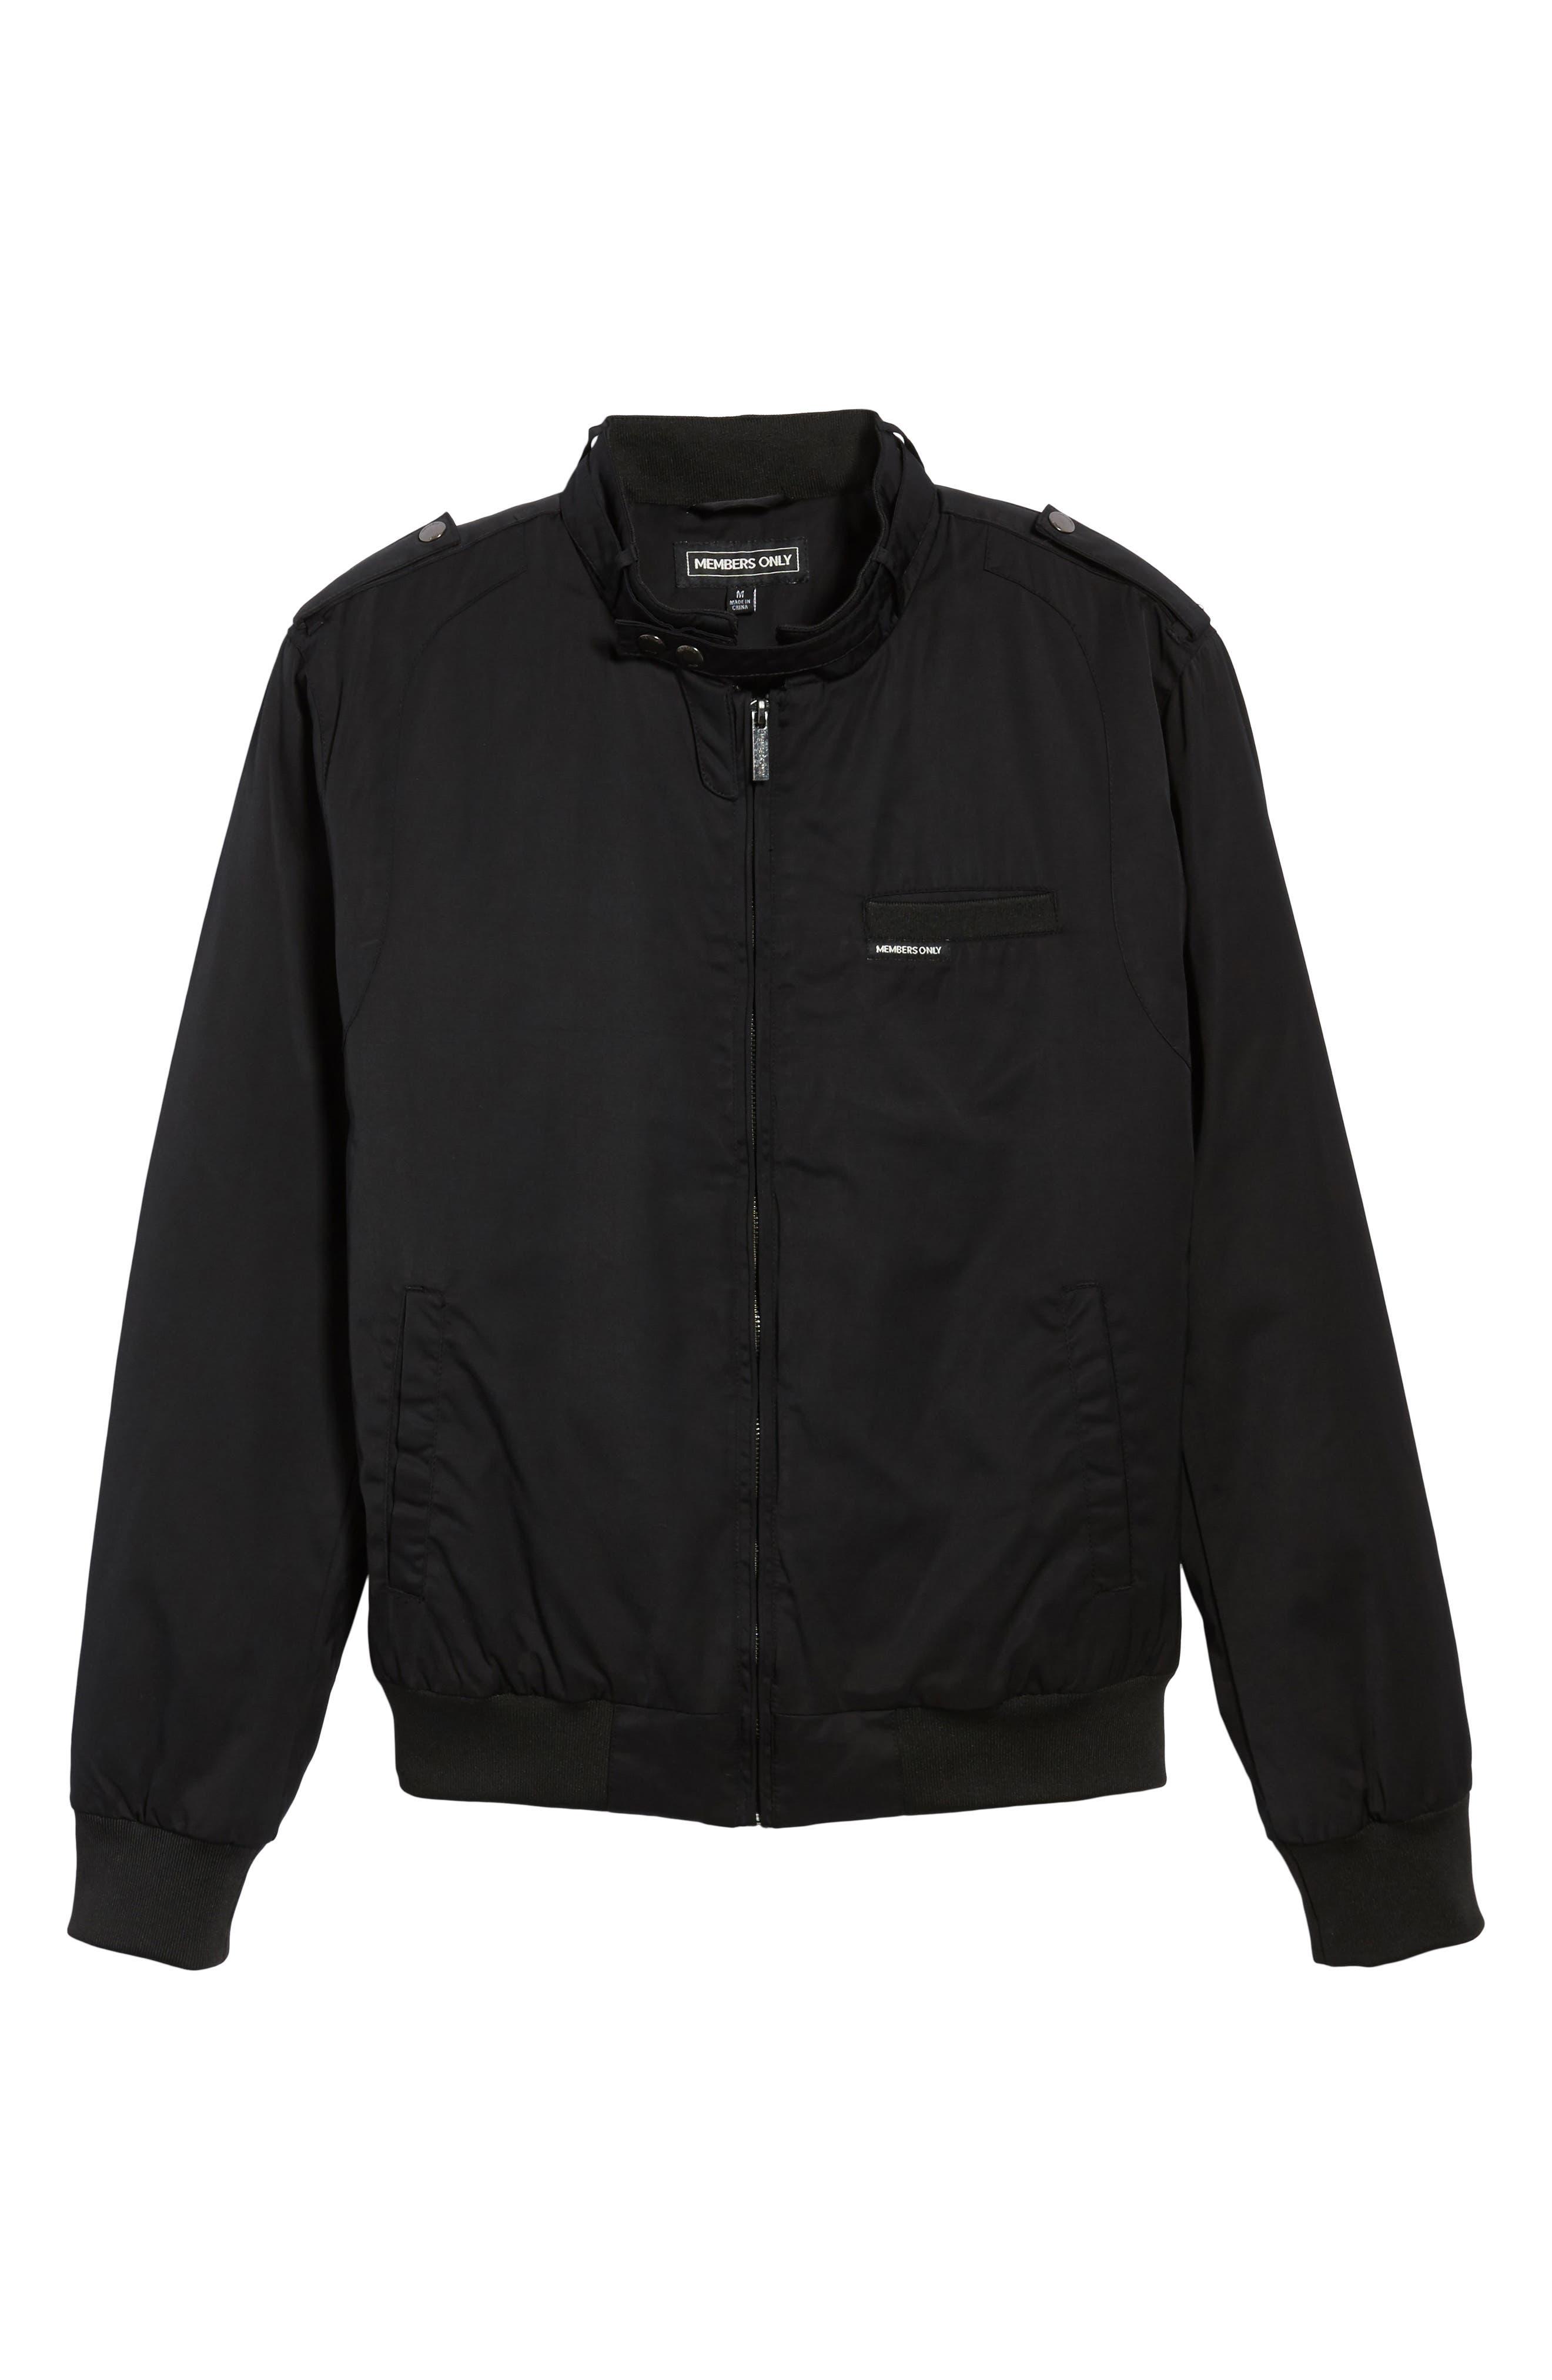 Twill Iconic Jacket,                             Alternate thumbnail 5, color,                             001